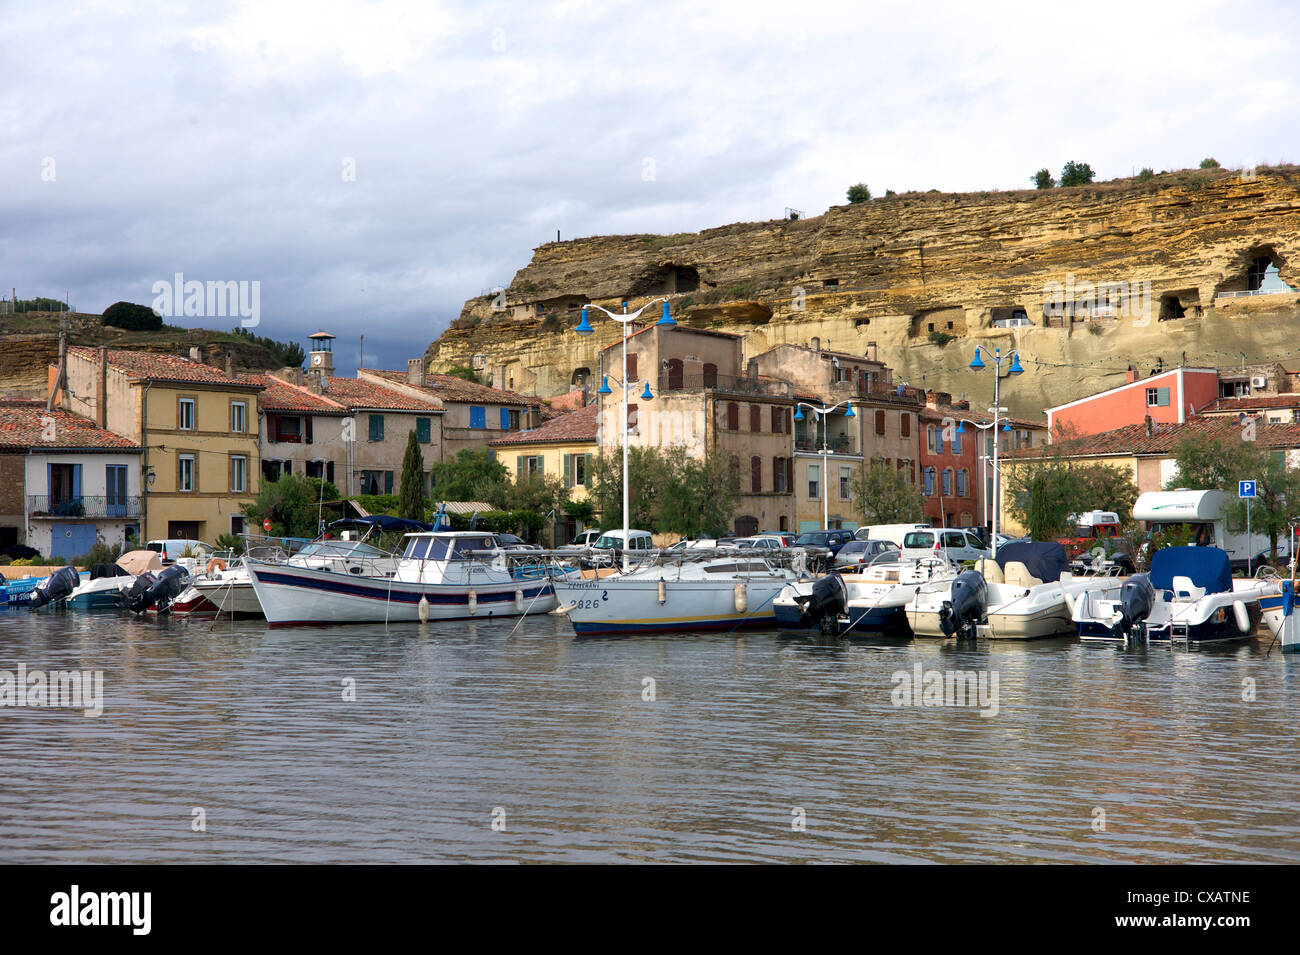 St. Chamas, Bouches-du-Rhone, Provence, France, Mediterranean, Europe - Stock Image